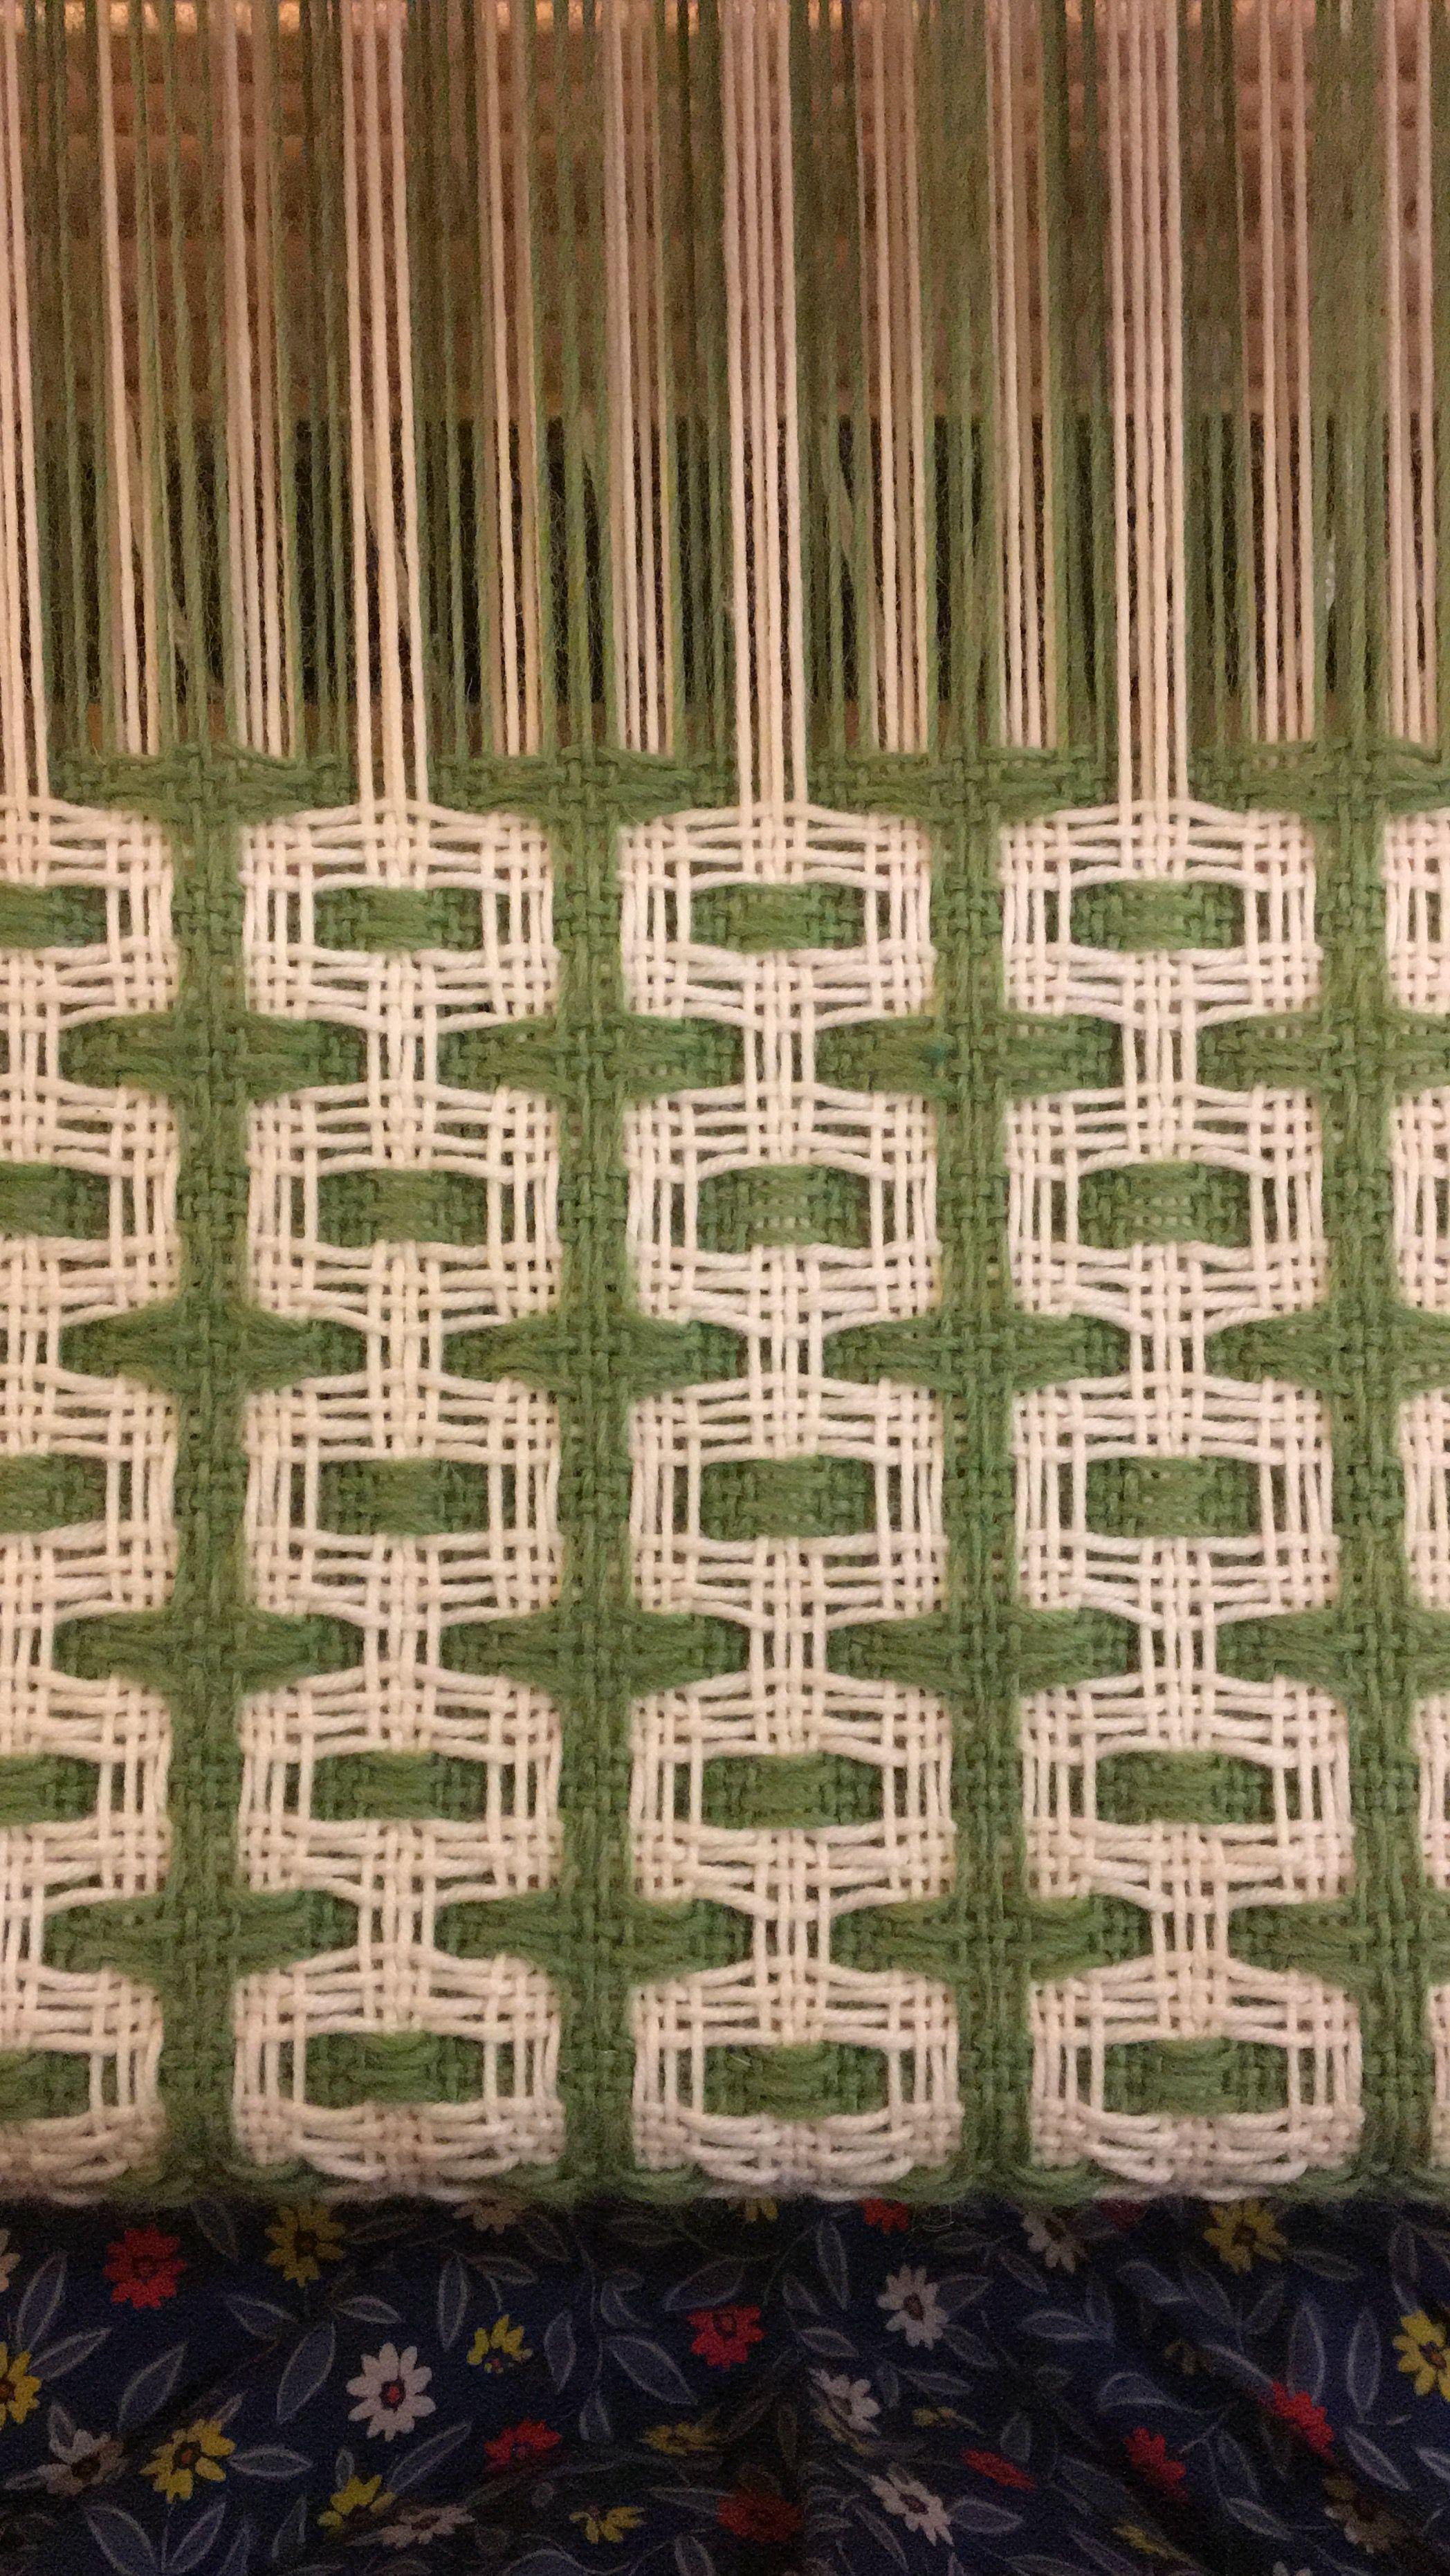 Double Deflected weave pattern on the loom | Weben | Pinterest ...